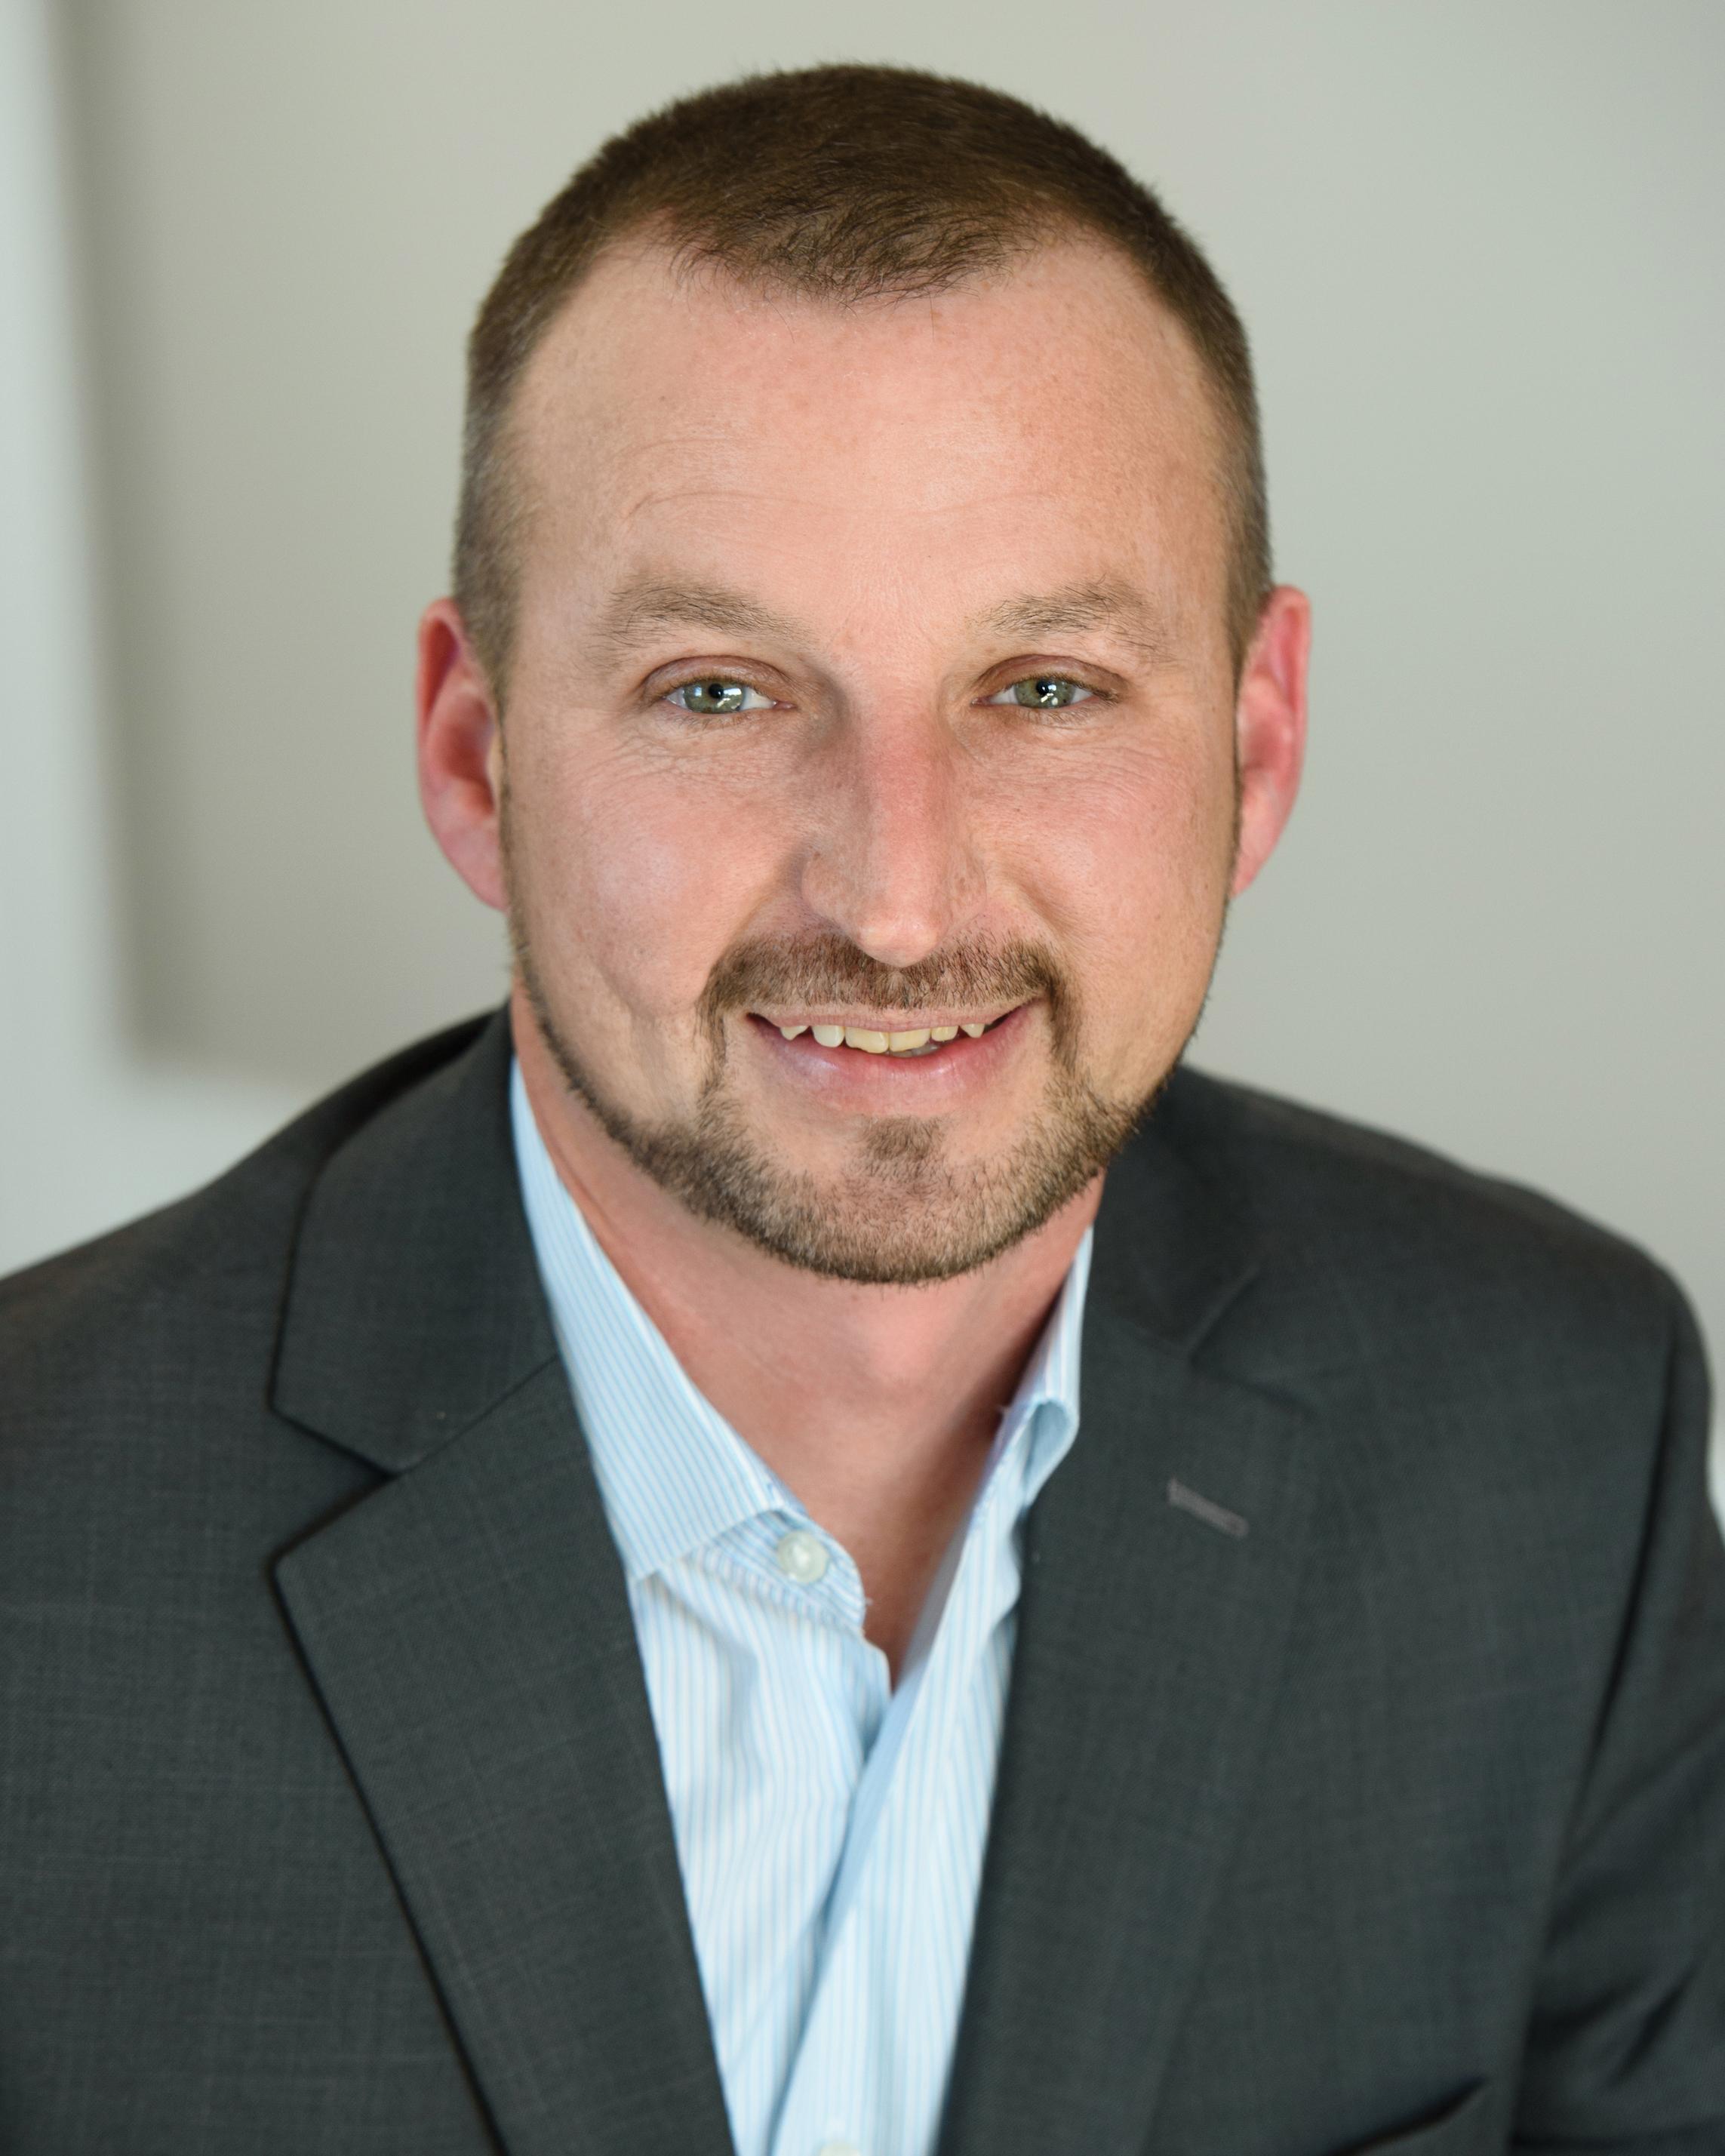 Brian Hopson, REALTOR®/Broker, F. C. Tucker Company, Inc.